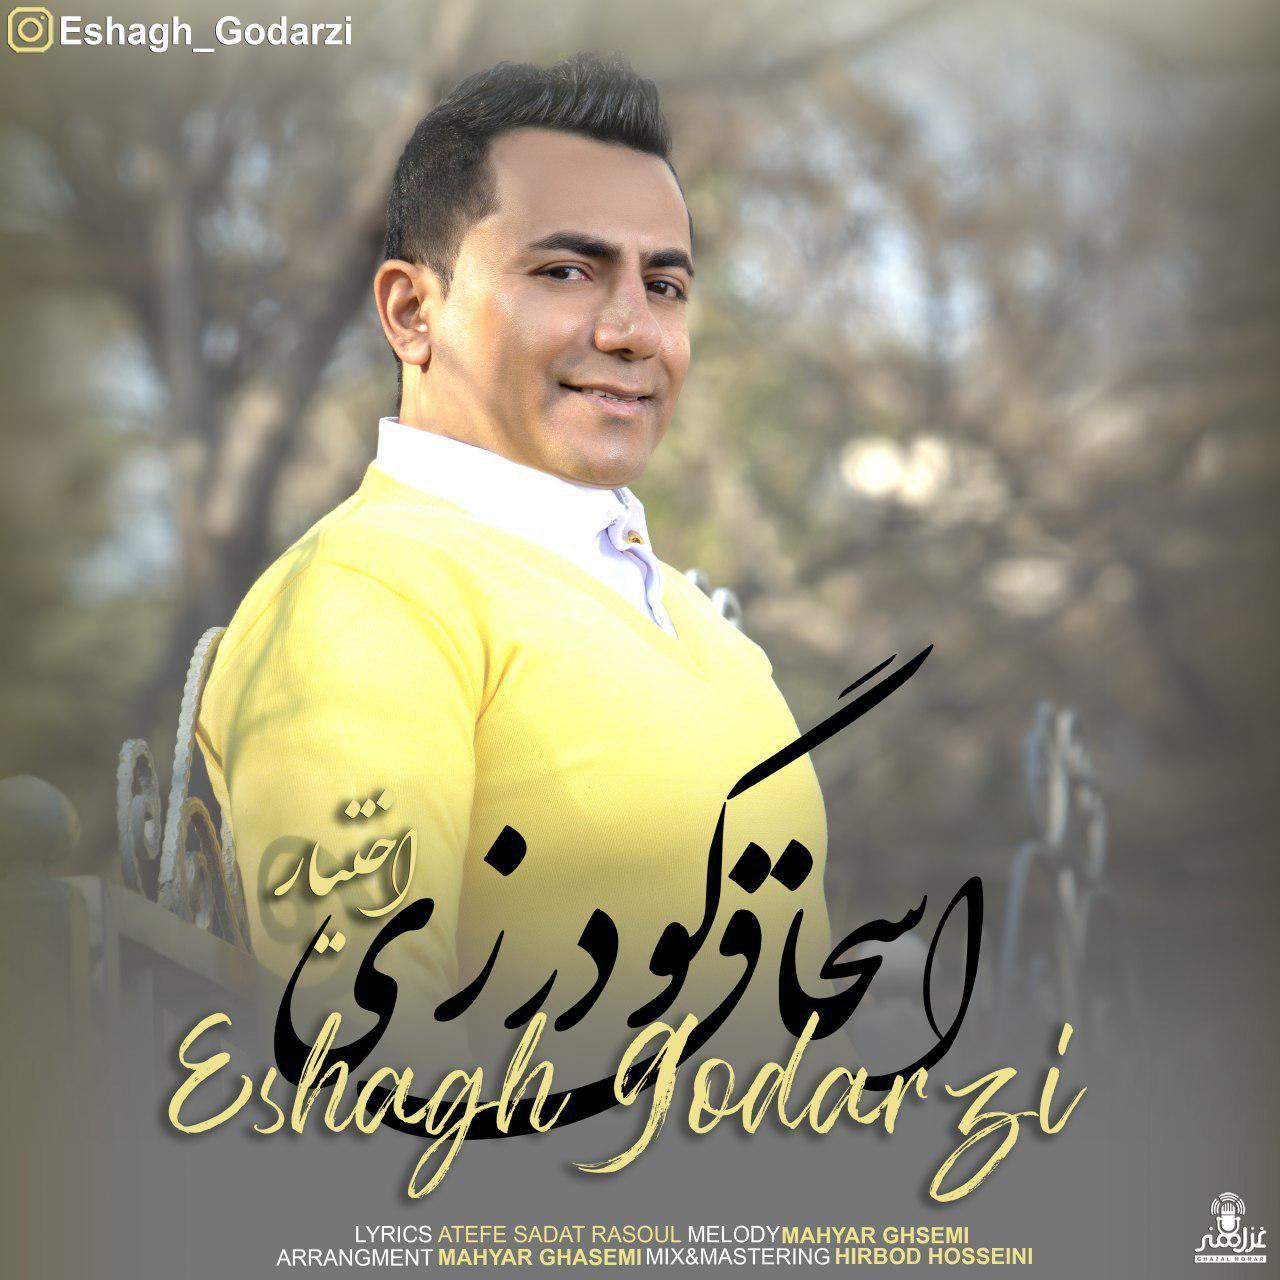 Eshagh Goodarzi – Ekhtiar